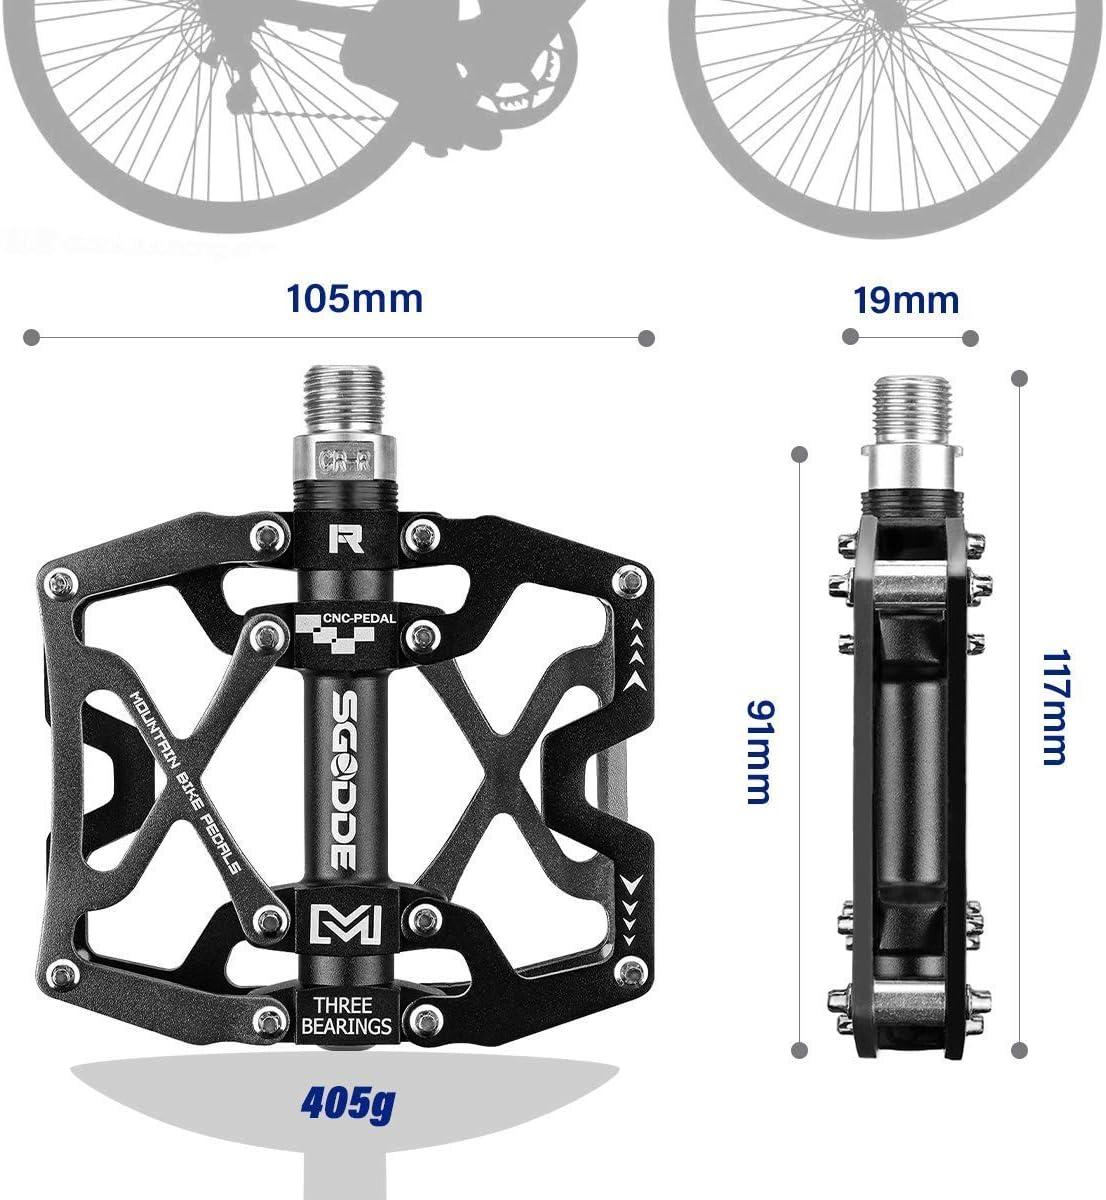 DE MTB BMX Mountain Road Bike Pedal Magnesium 3 Bearing Flat Platform Neuer Stil